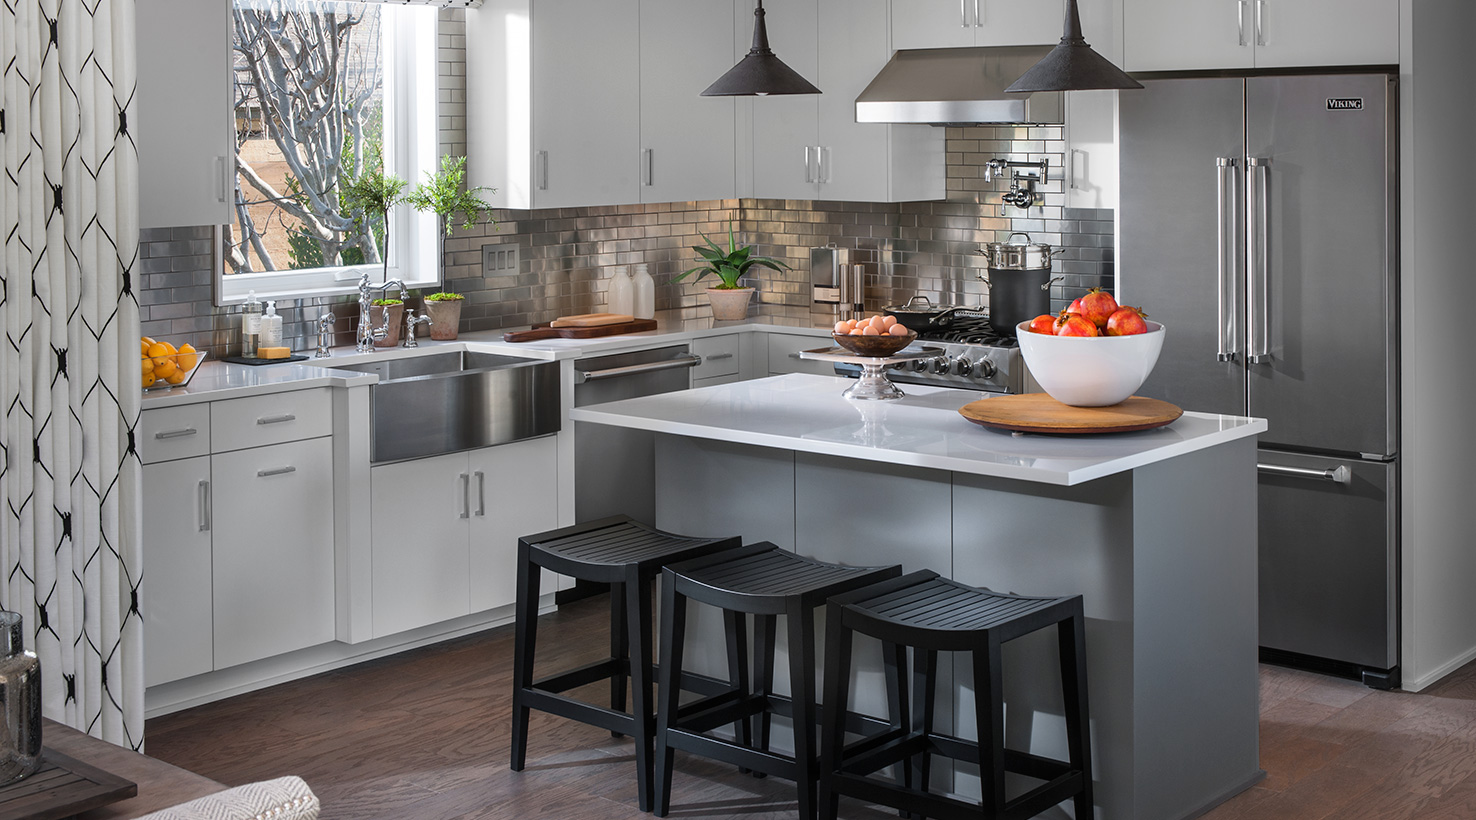 Hgtv Home Sherwin Williams Paint Kitchen Cabinets White